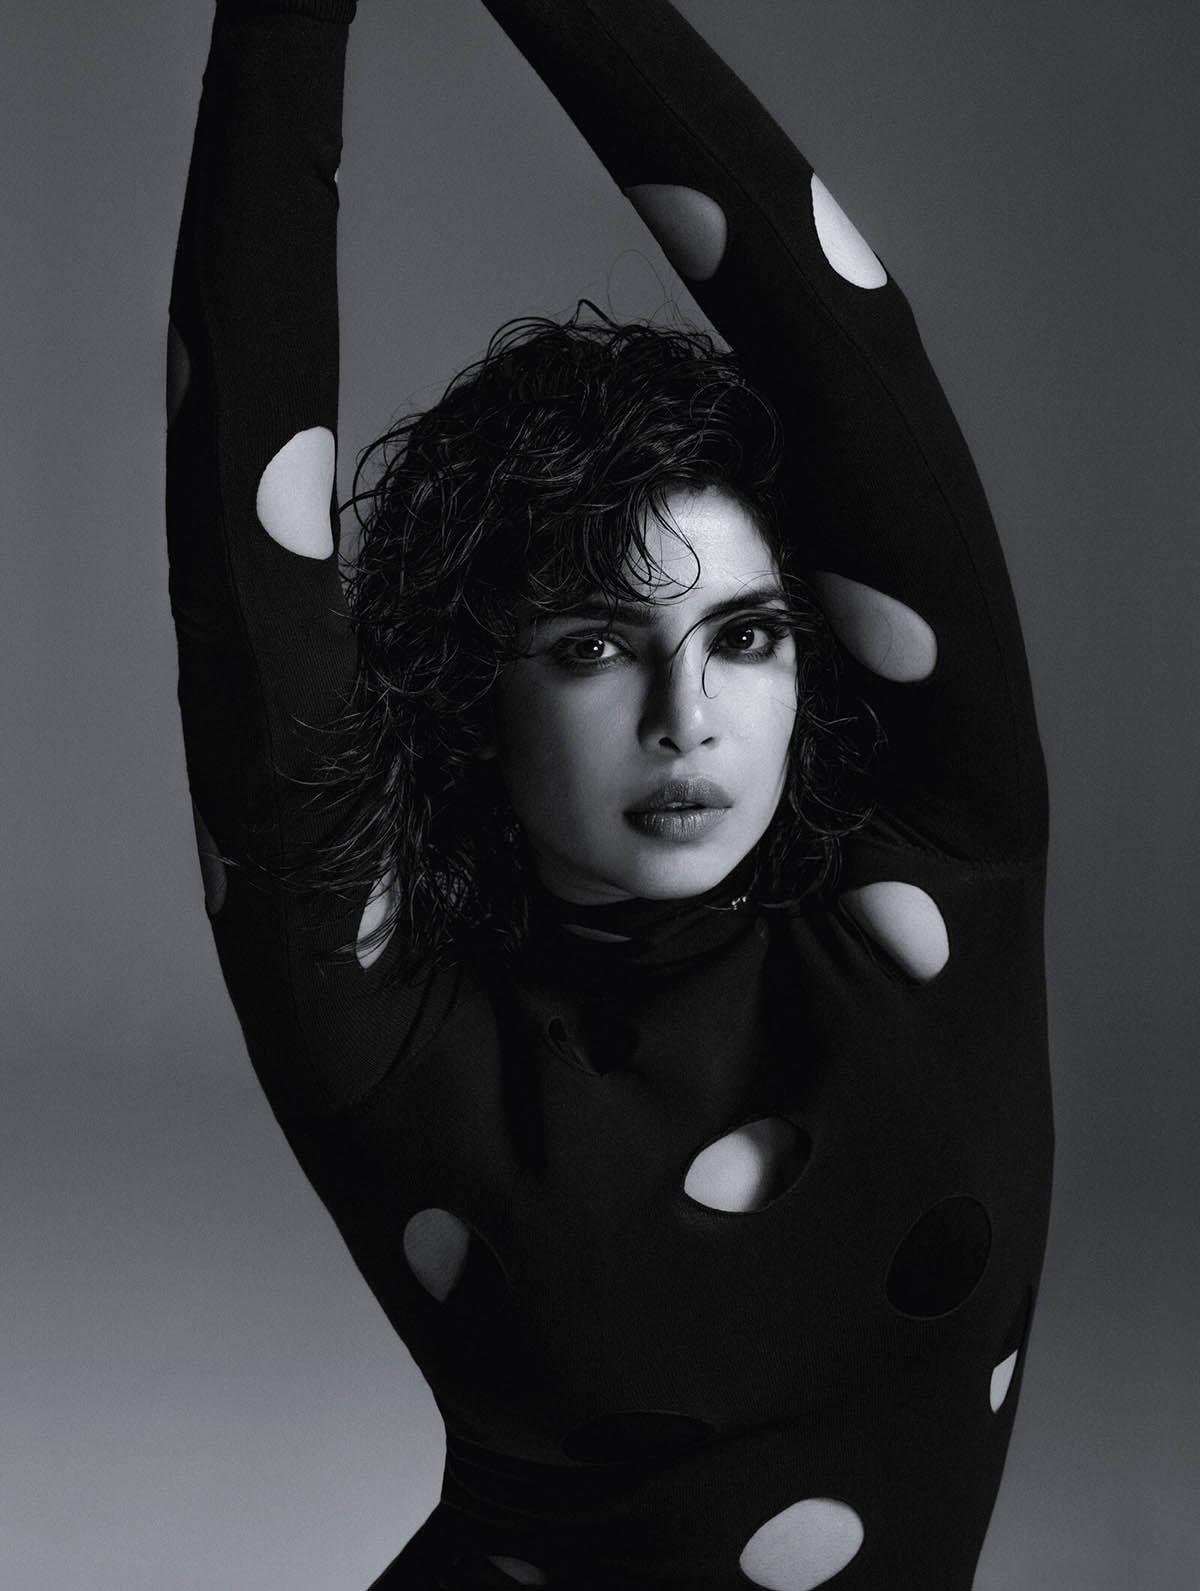 Priyanka Chopra covers Elle UK March 2021 by Lia Clay Miller